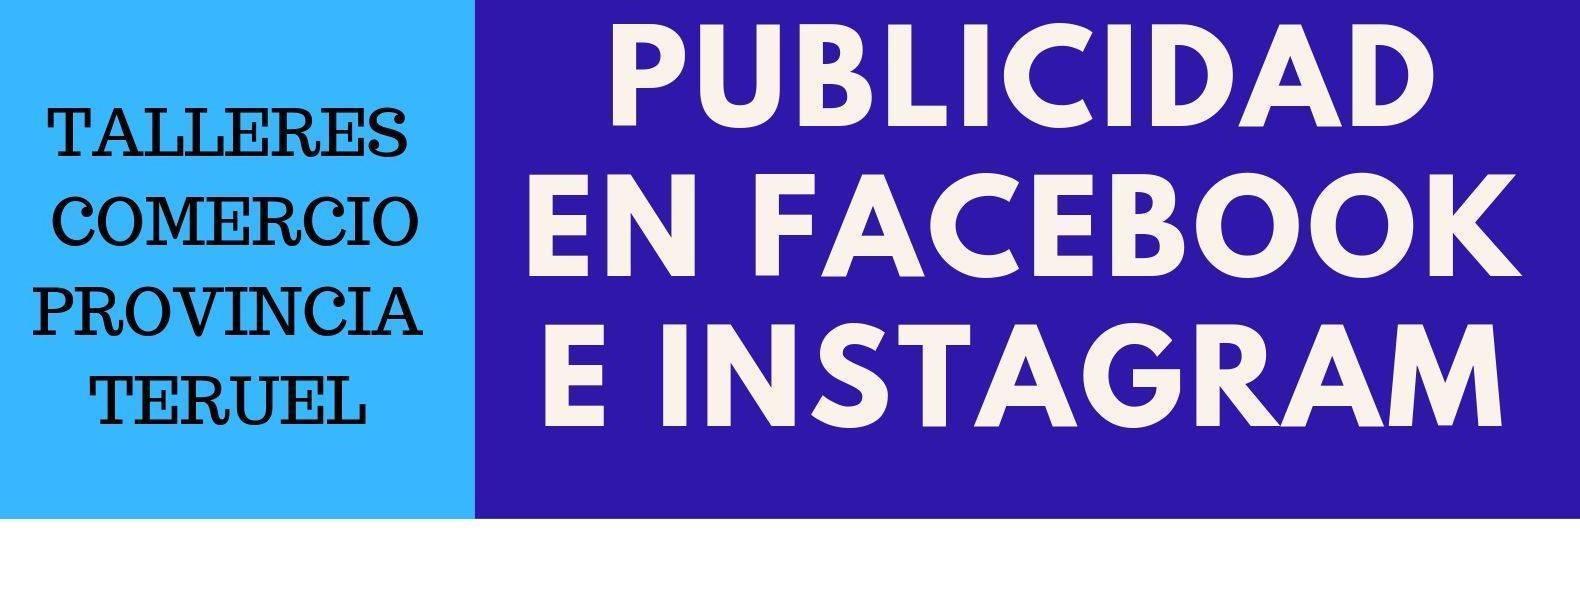 Taller PUBLICIDAD EN FACEBOOK E INSTA...